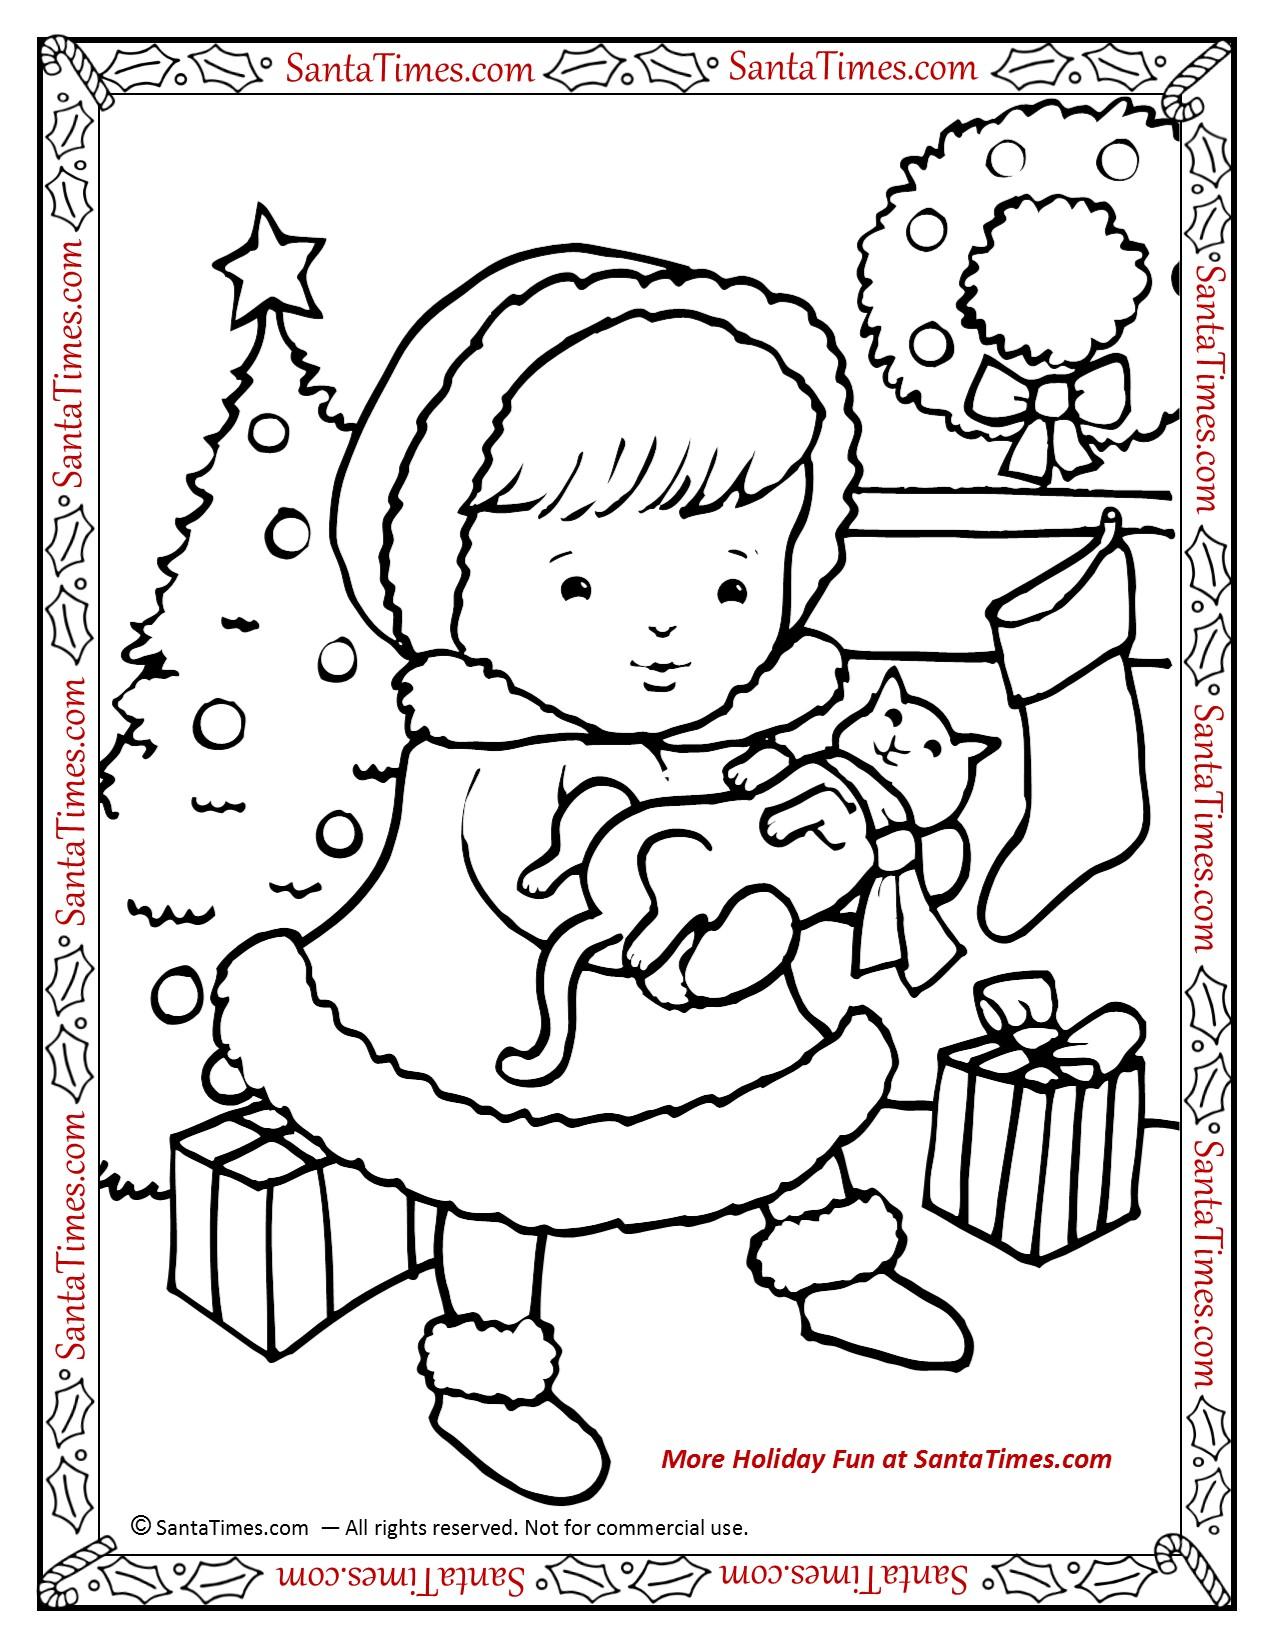 Merry Christmas Kitty Printable Coloring Page